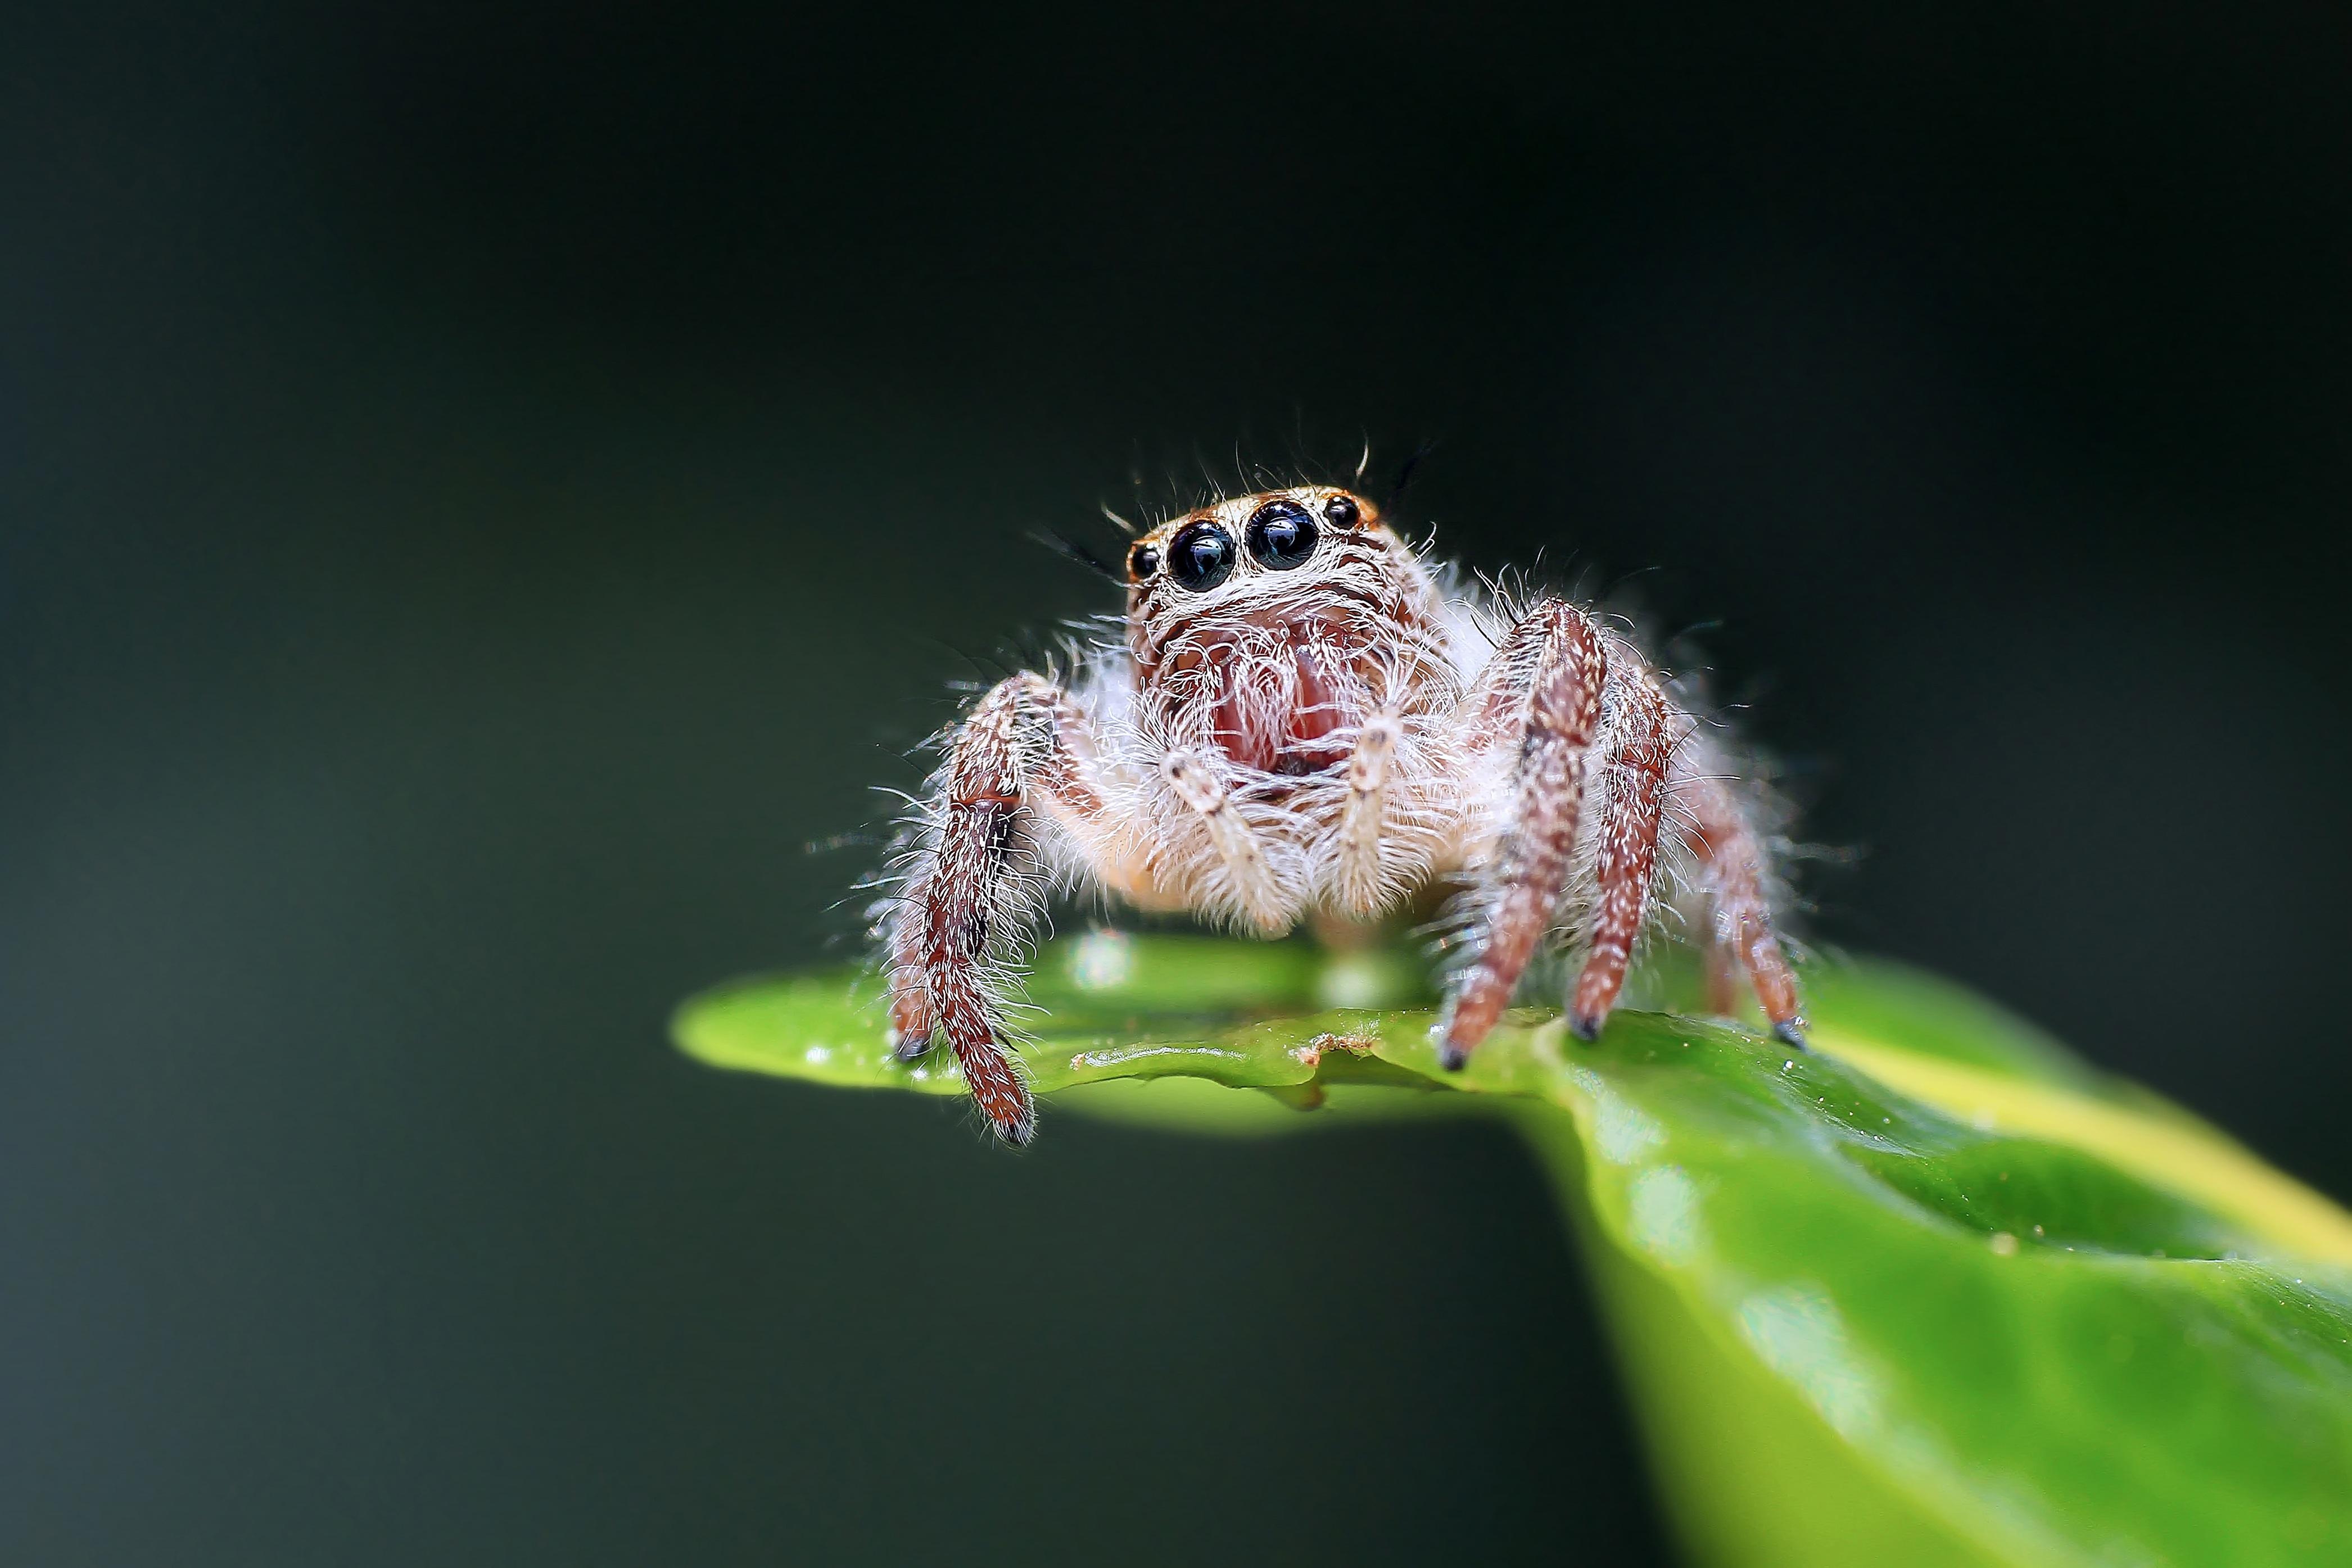 spider pictures pexels free stock photos